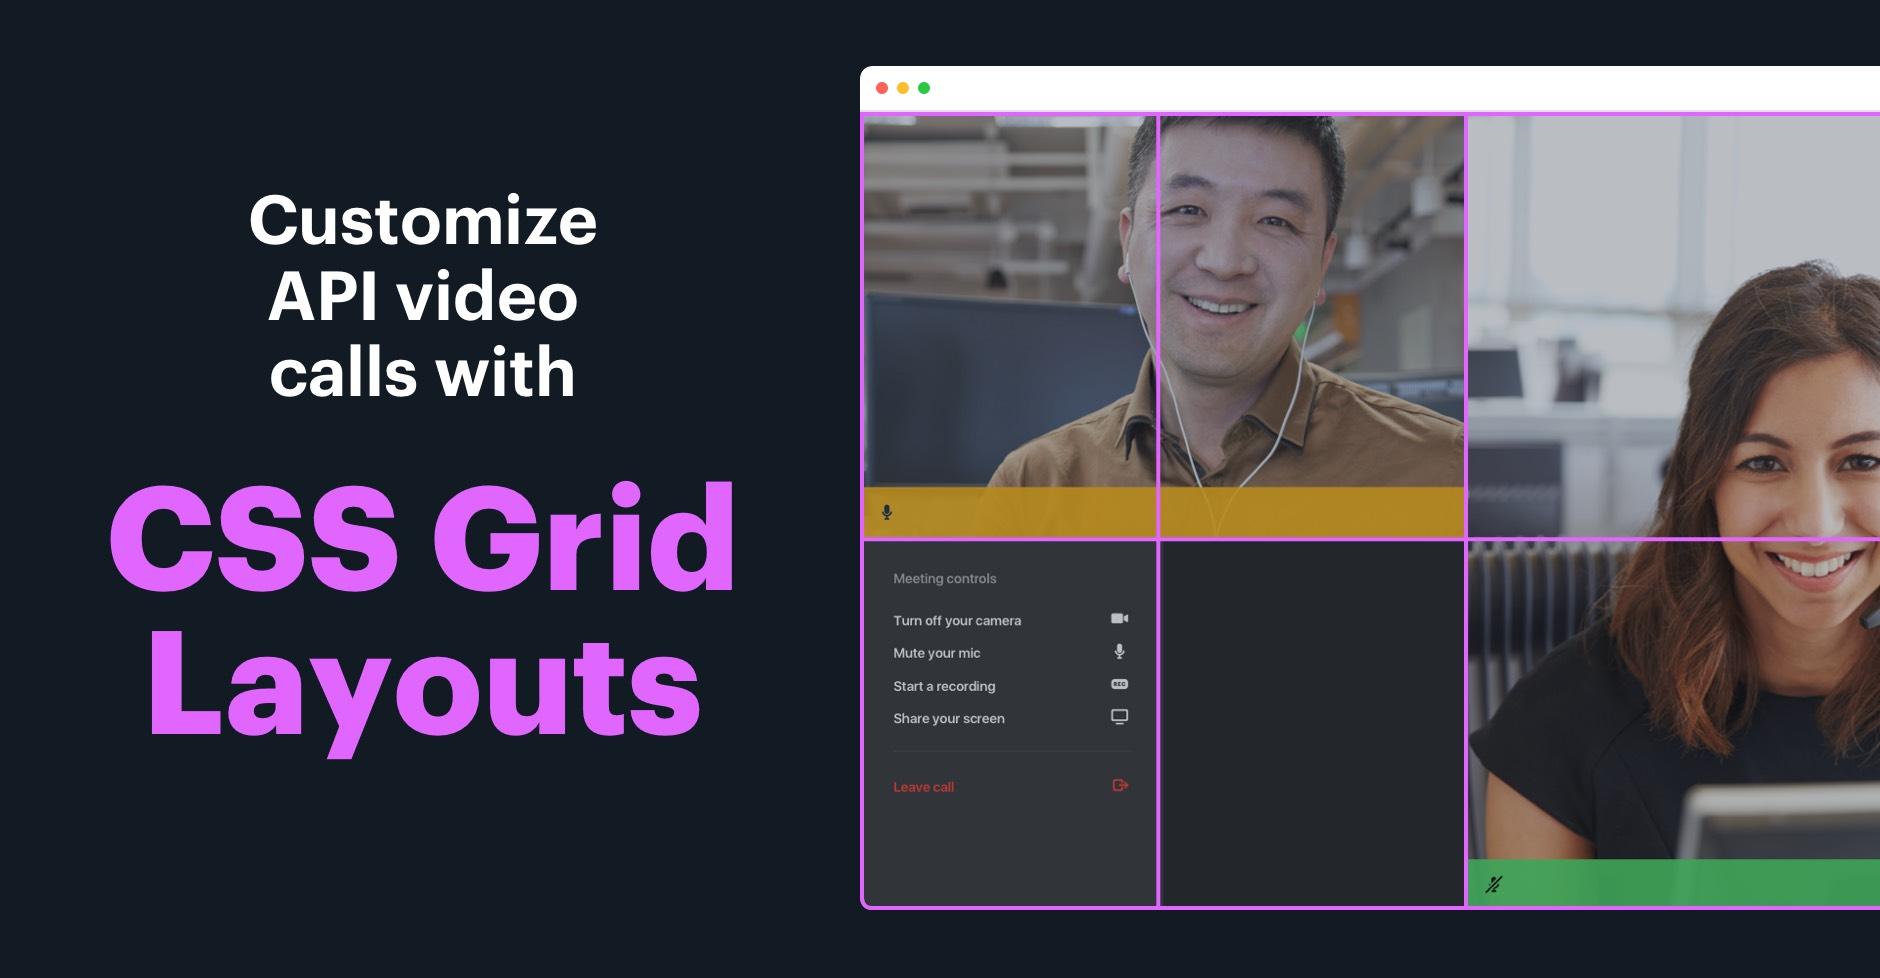 Using CSS Grid to create custom API video call layouts